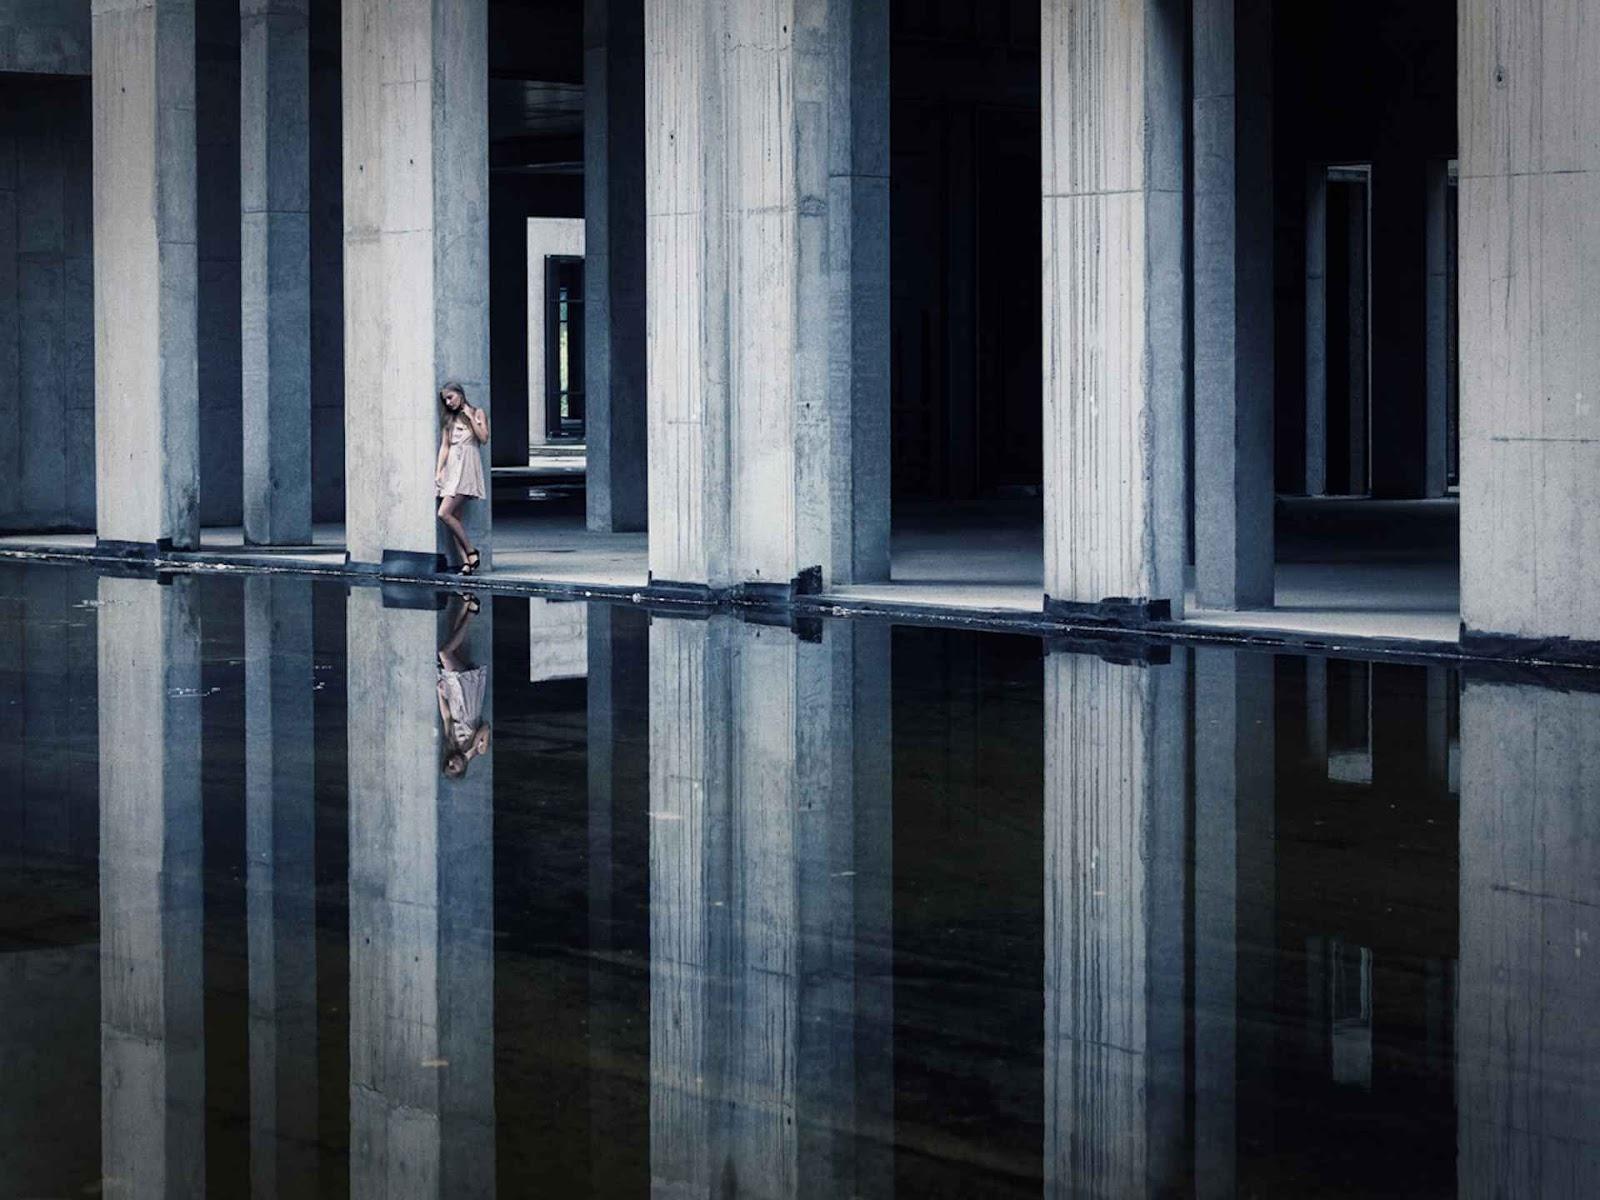 На краю мира II, фотограф Петер Целей